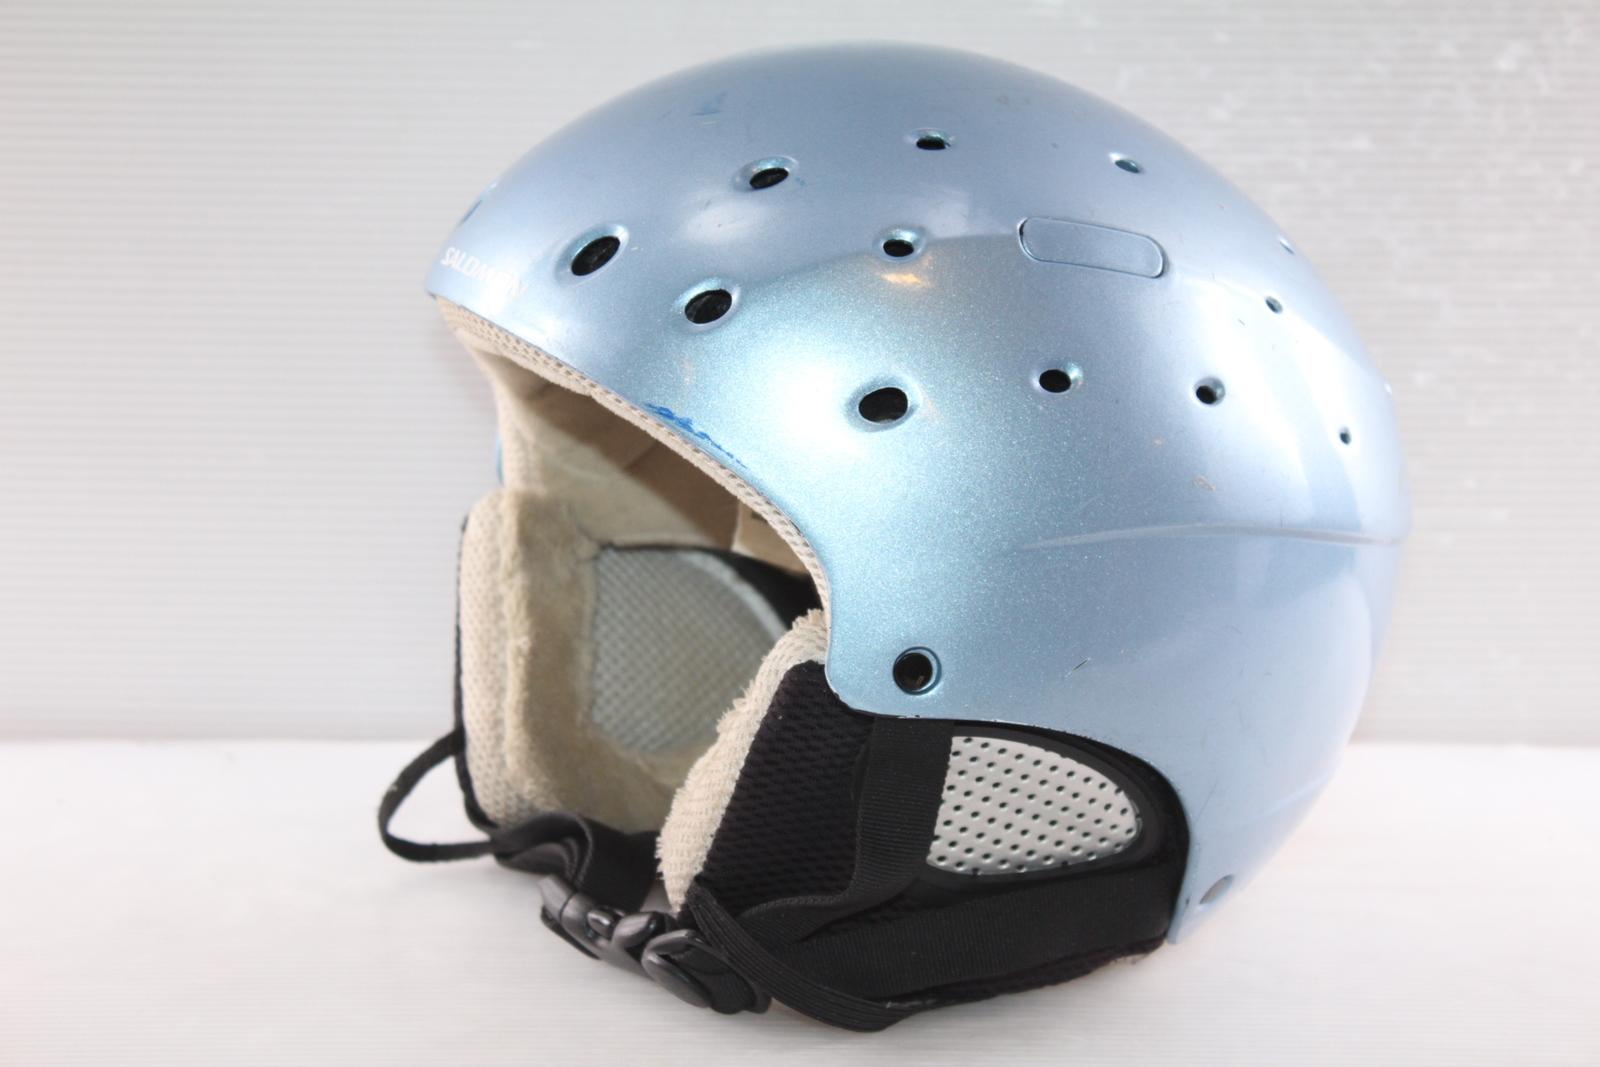 Dámská lyžařská helma Salomon Charm vel. 54